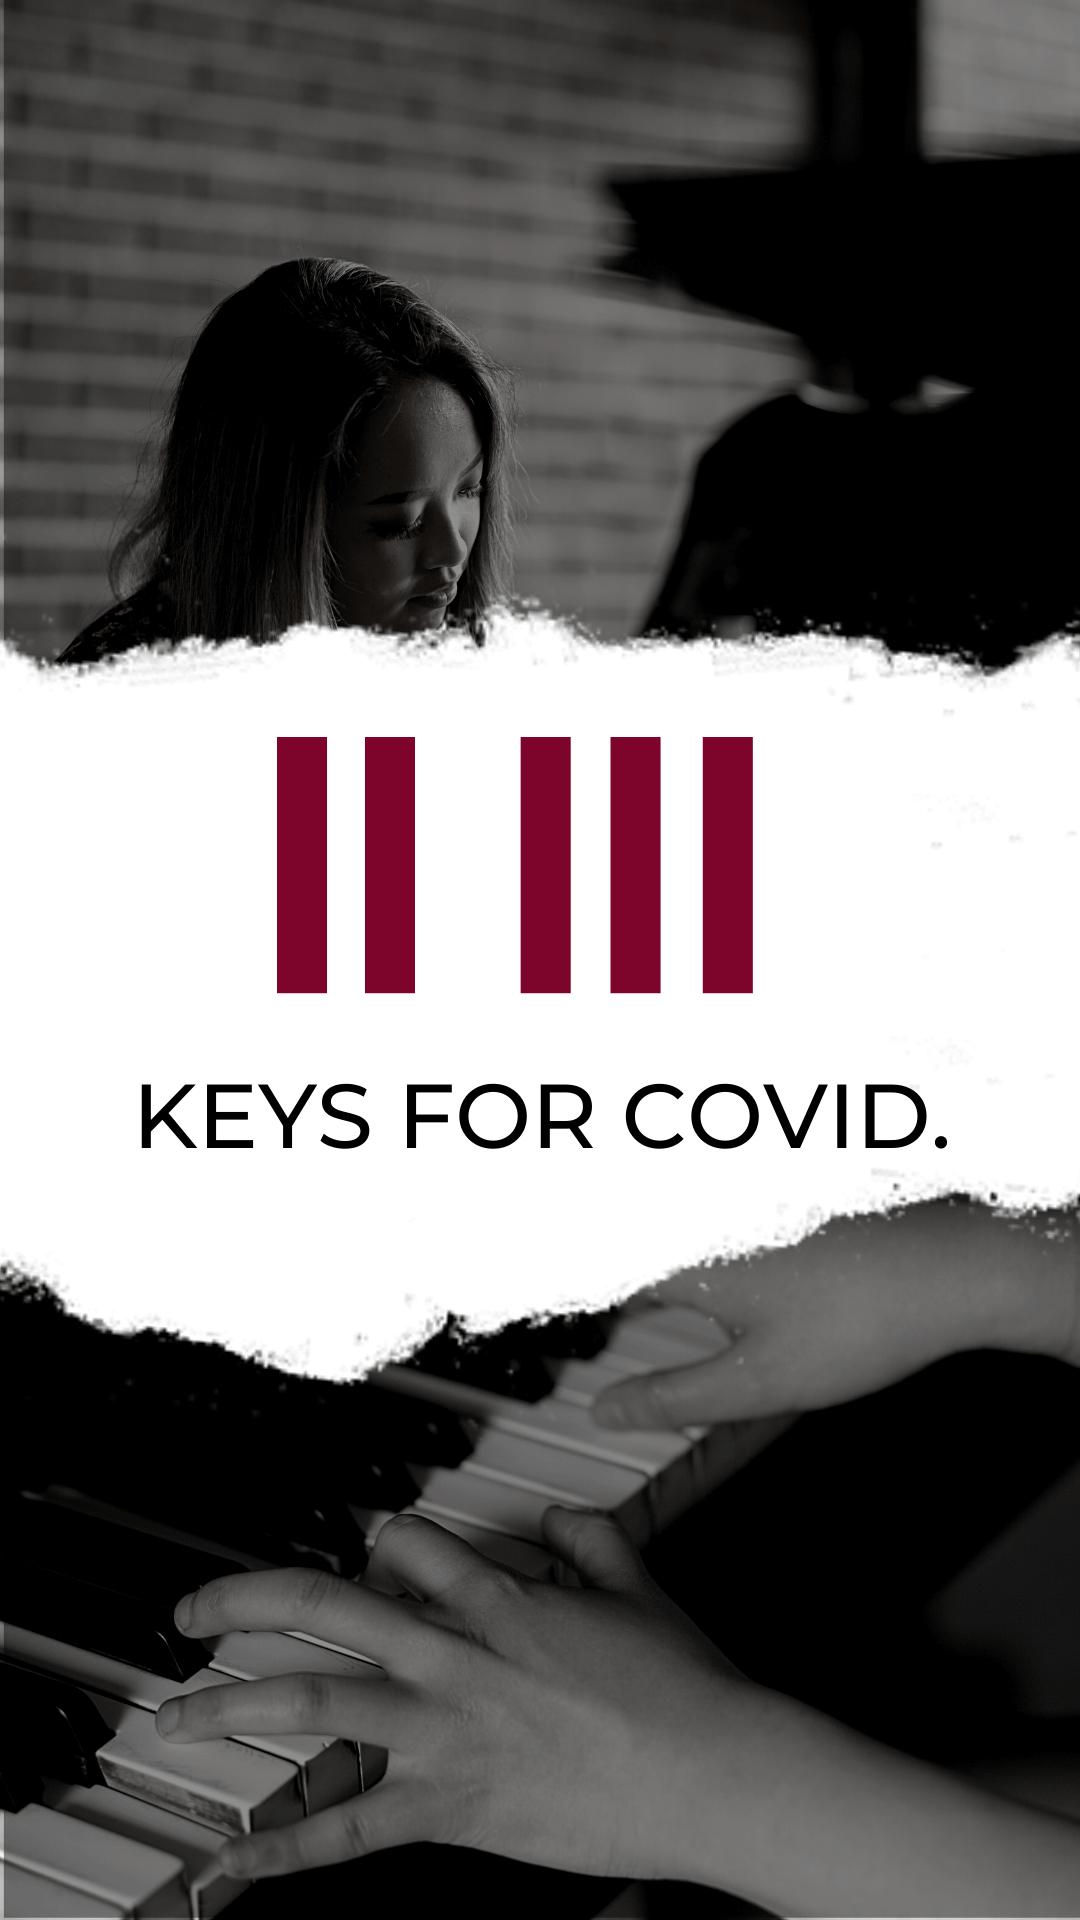 Keys for COVID